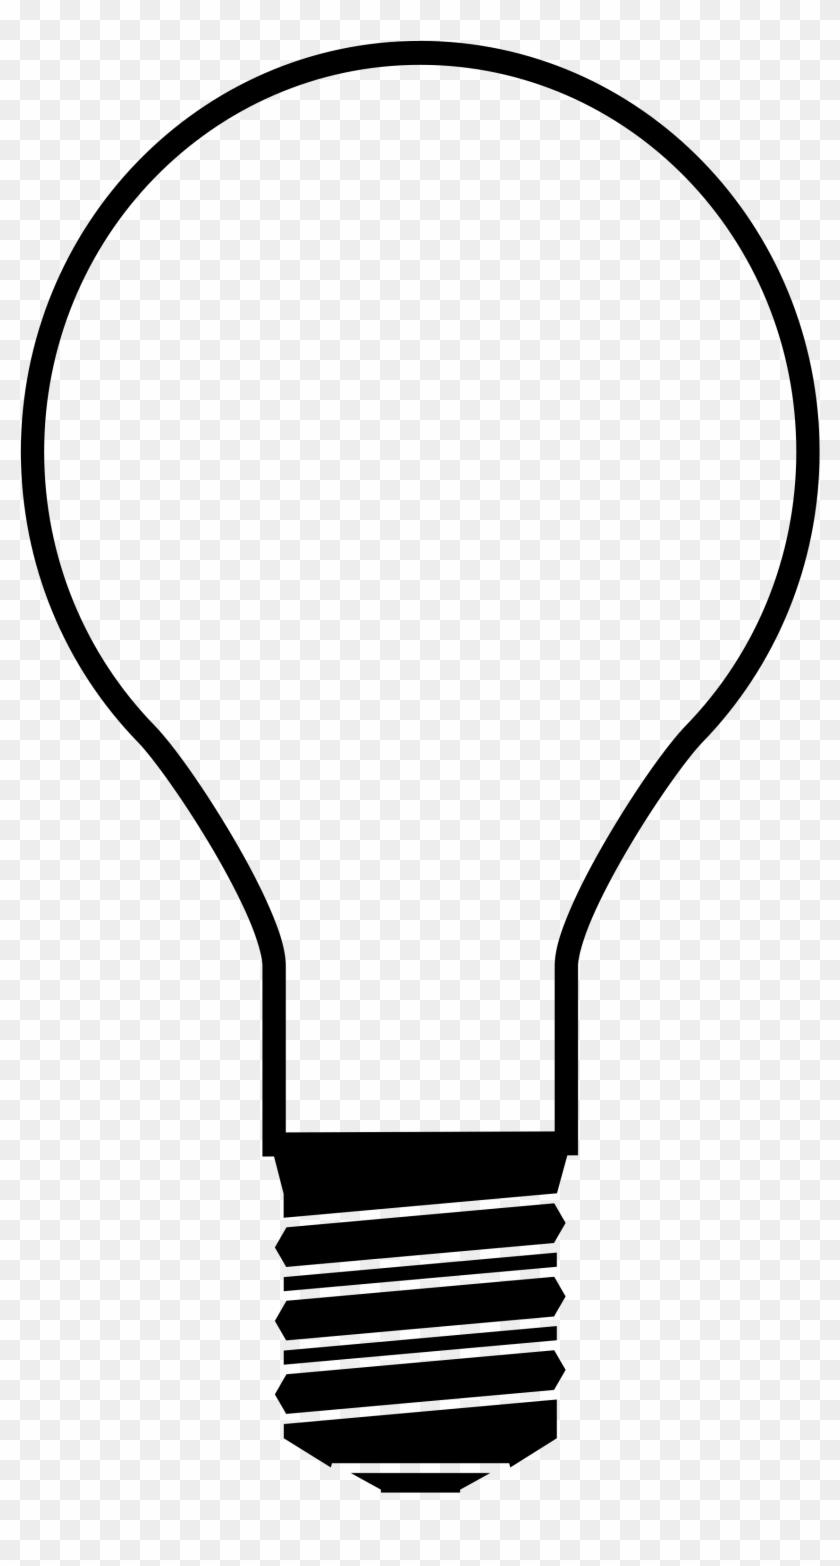 Light Bulb Lightbulb Clipart Free Images Clipartbold - Light Bulb Silhouette #150403